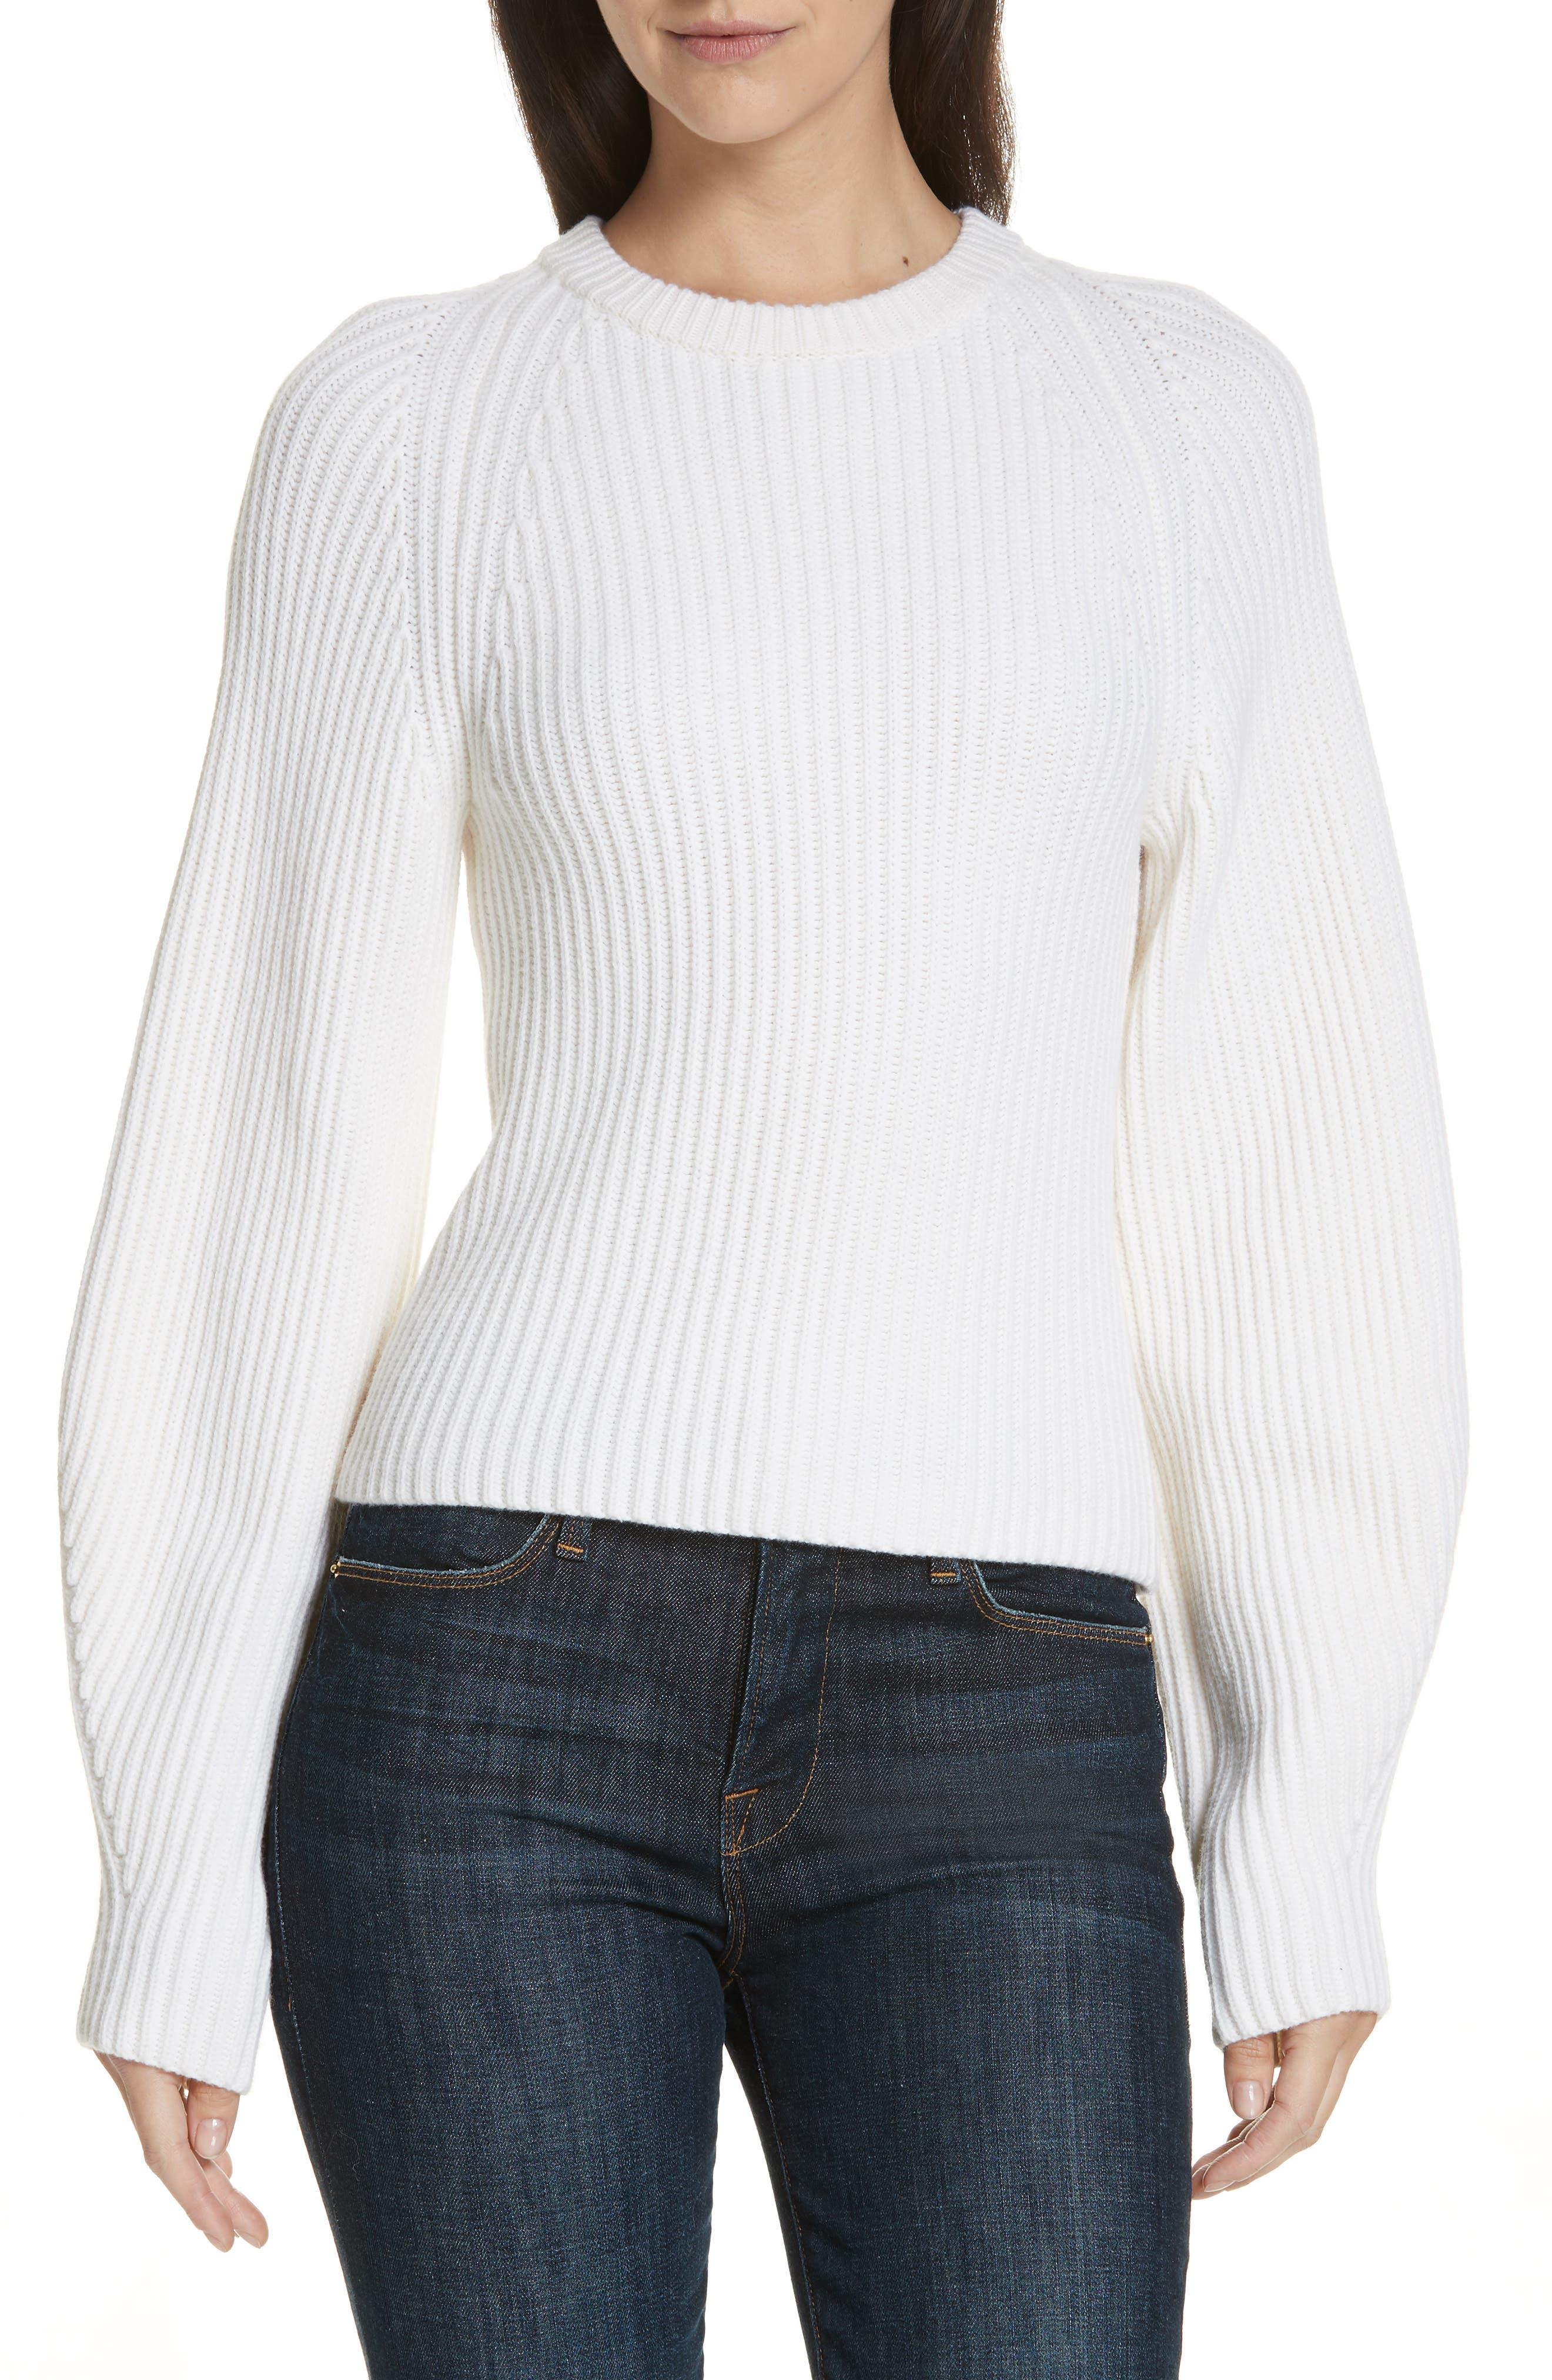 Theory Sculpted Sleeve Shaker Stitch Merino Wool Sweater, Ivory